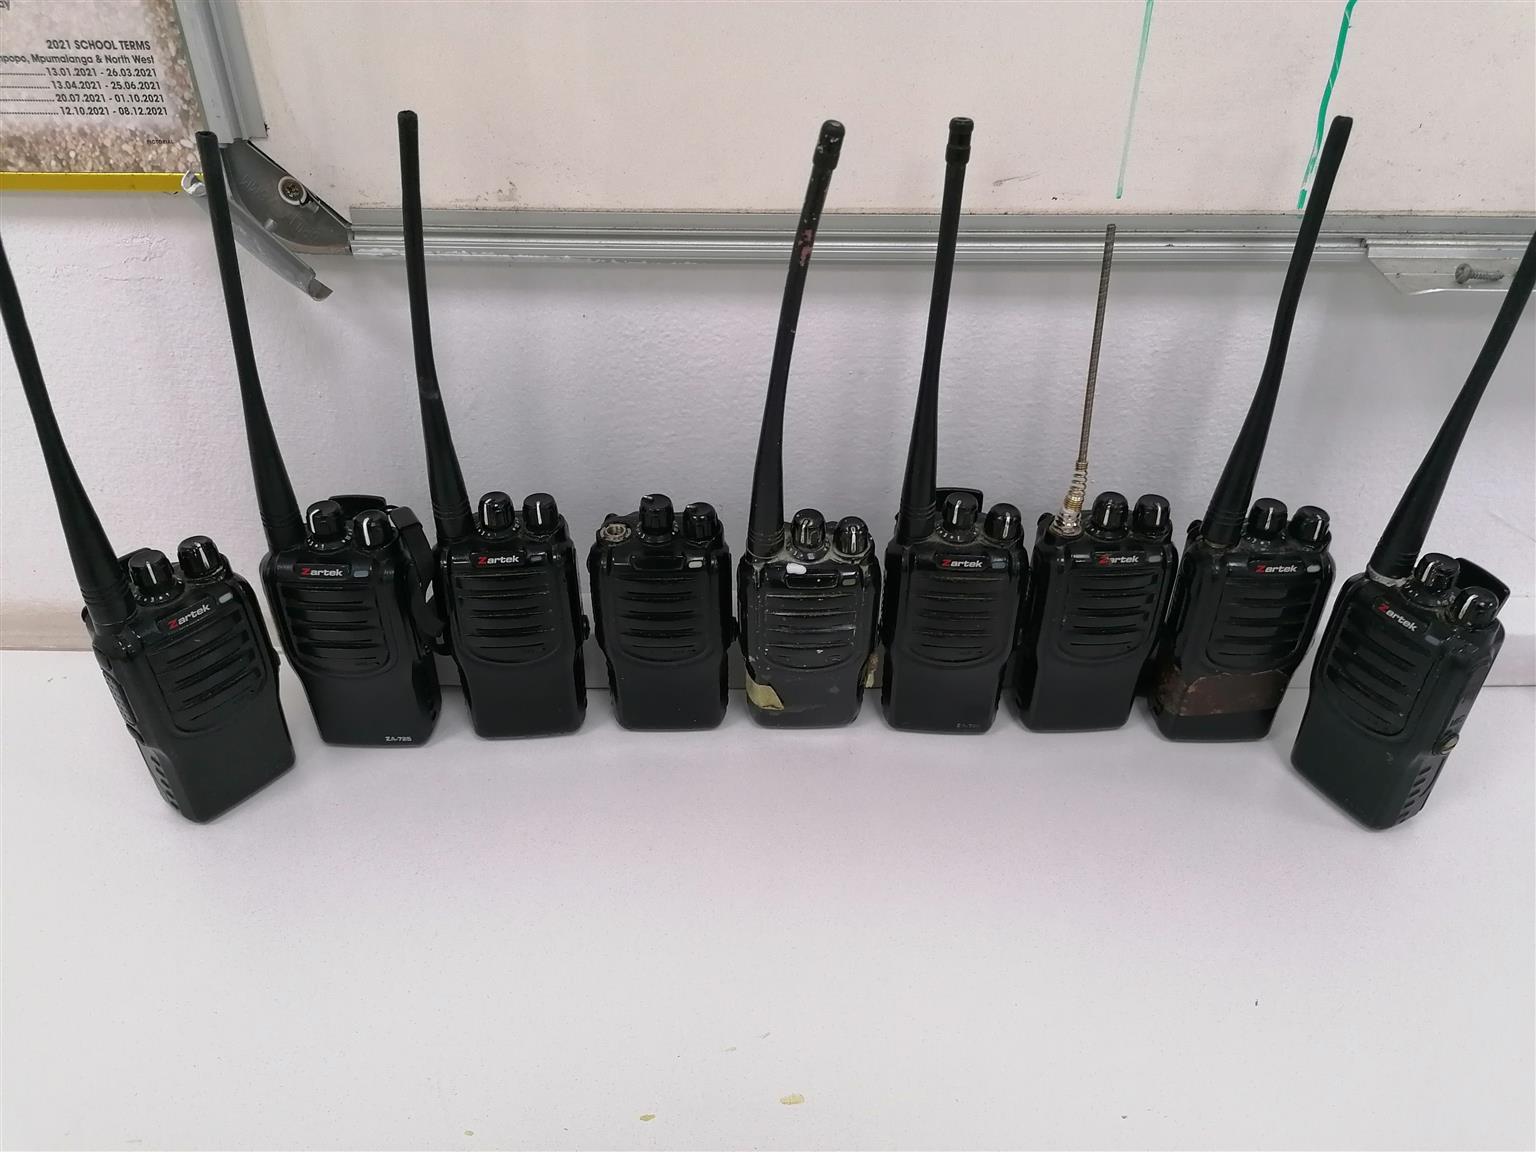 9 x zartek 2 way radios with chargers